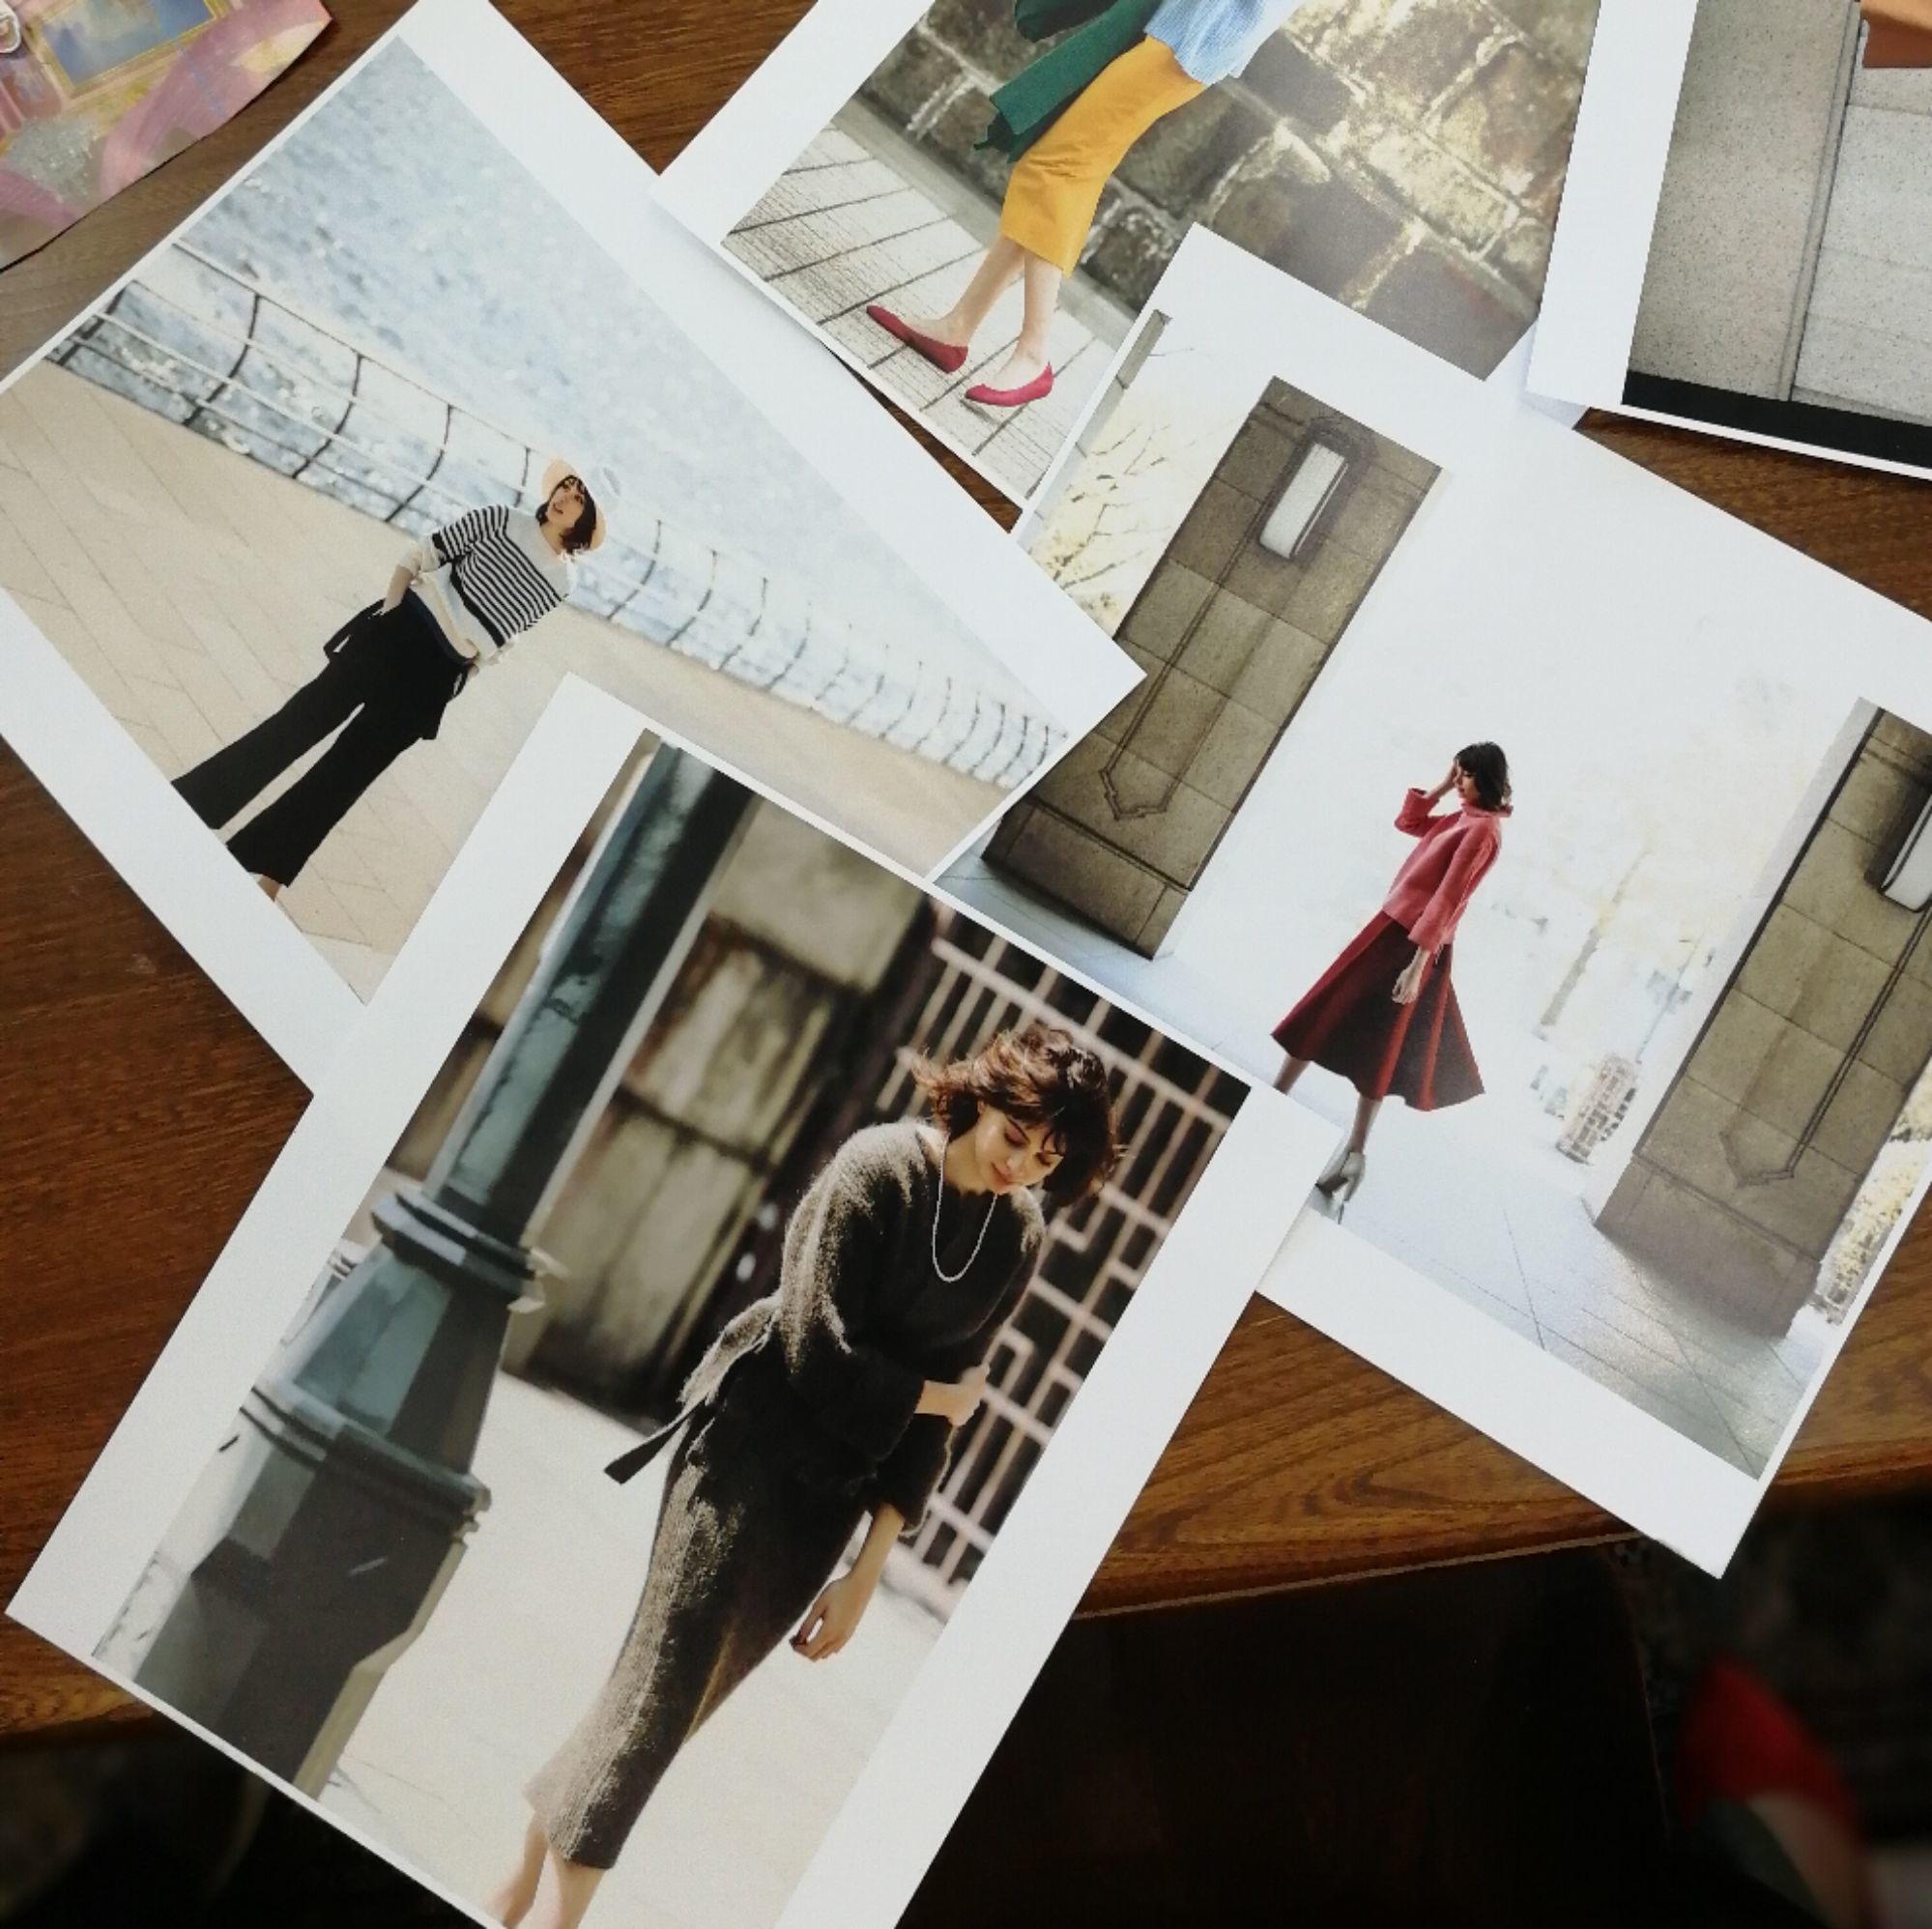 Marisol誌面で一目惚れしたスカートを求めて_1_1-1